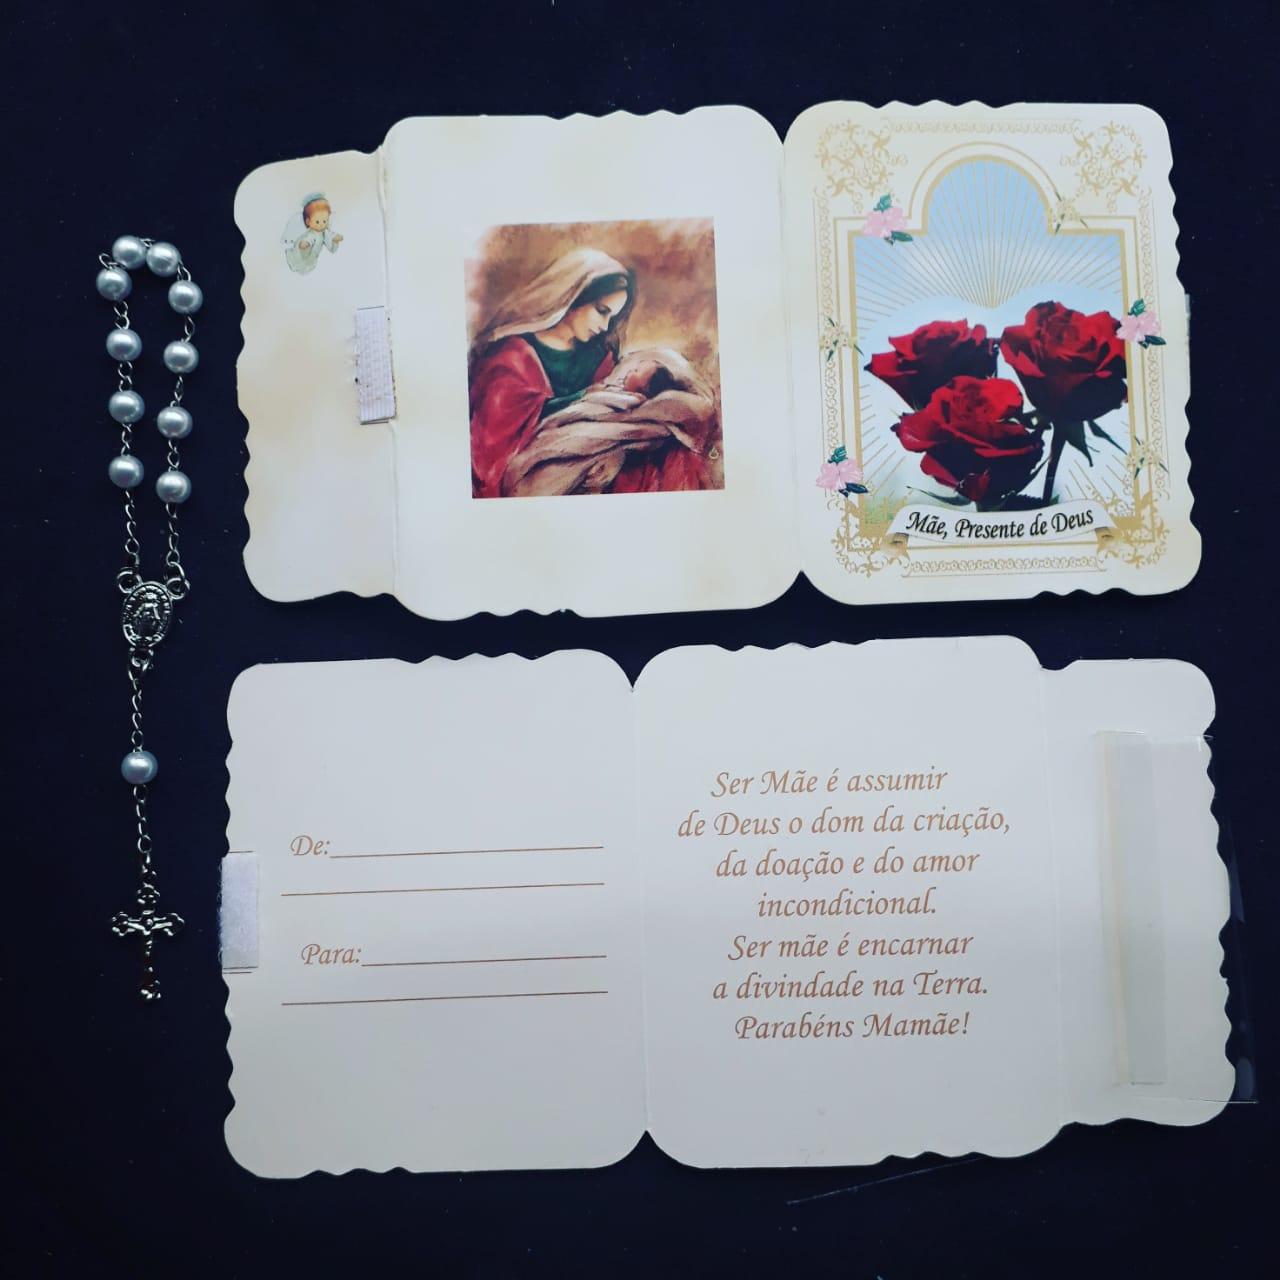 WE20 - Lembrança Dia das Mães c/ Dezena  - VindVedShop - Distribuidora Catolica